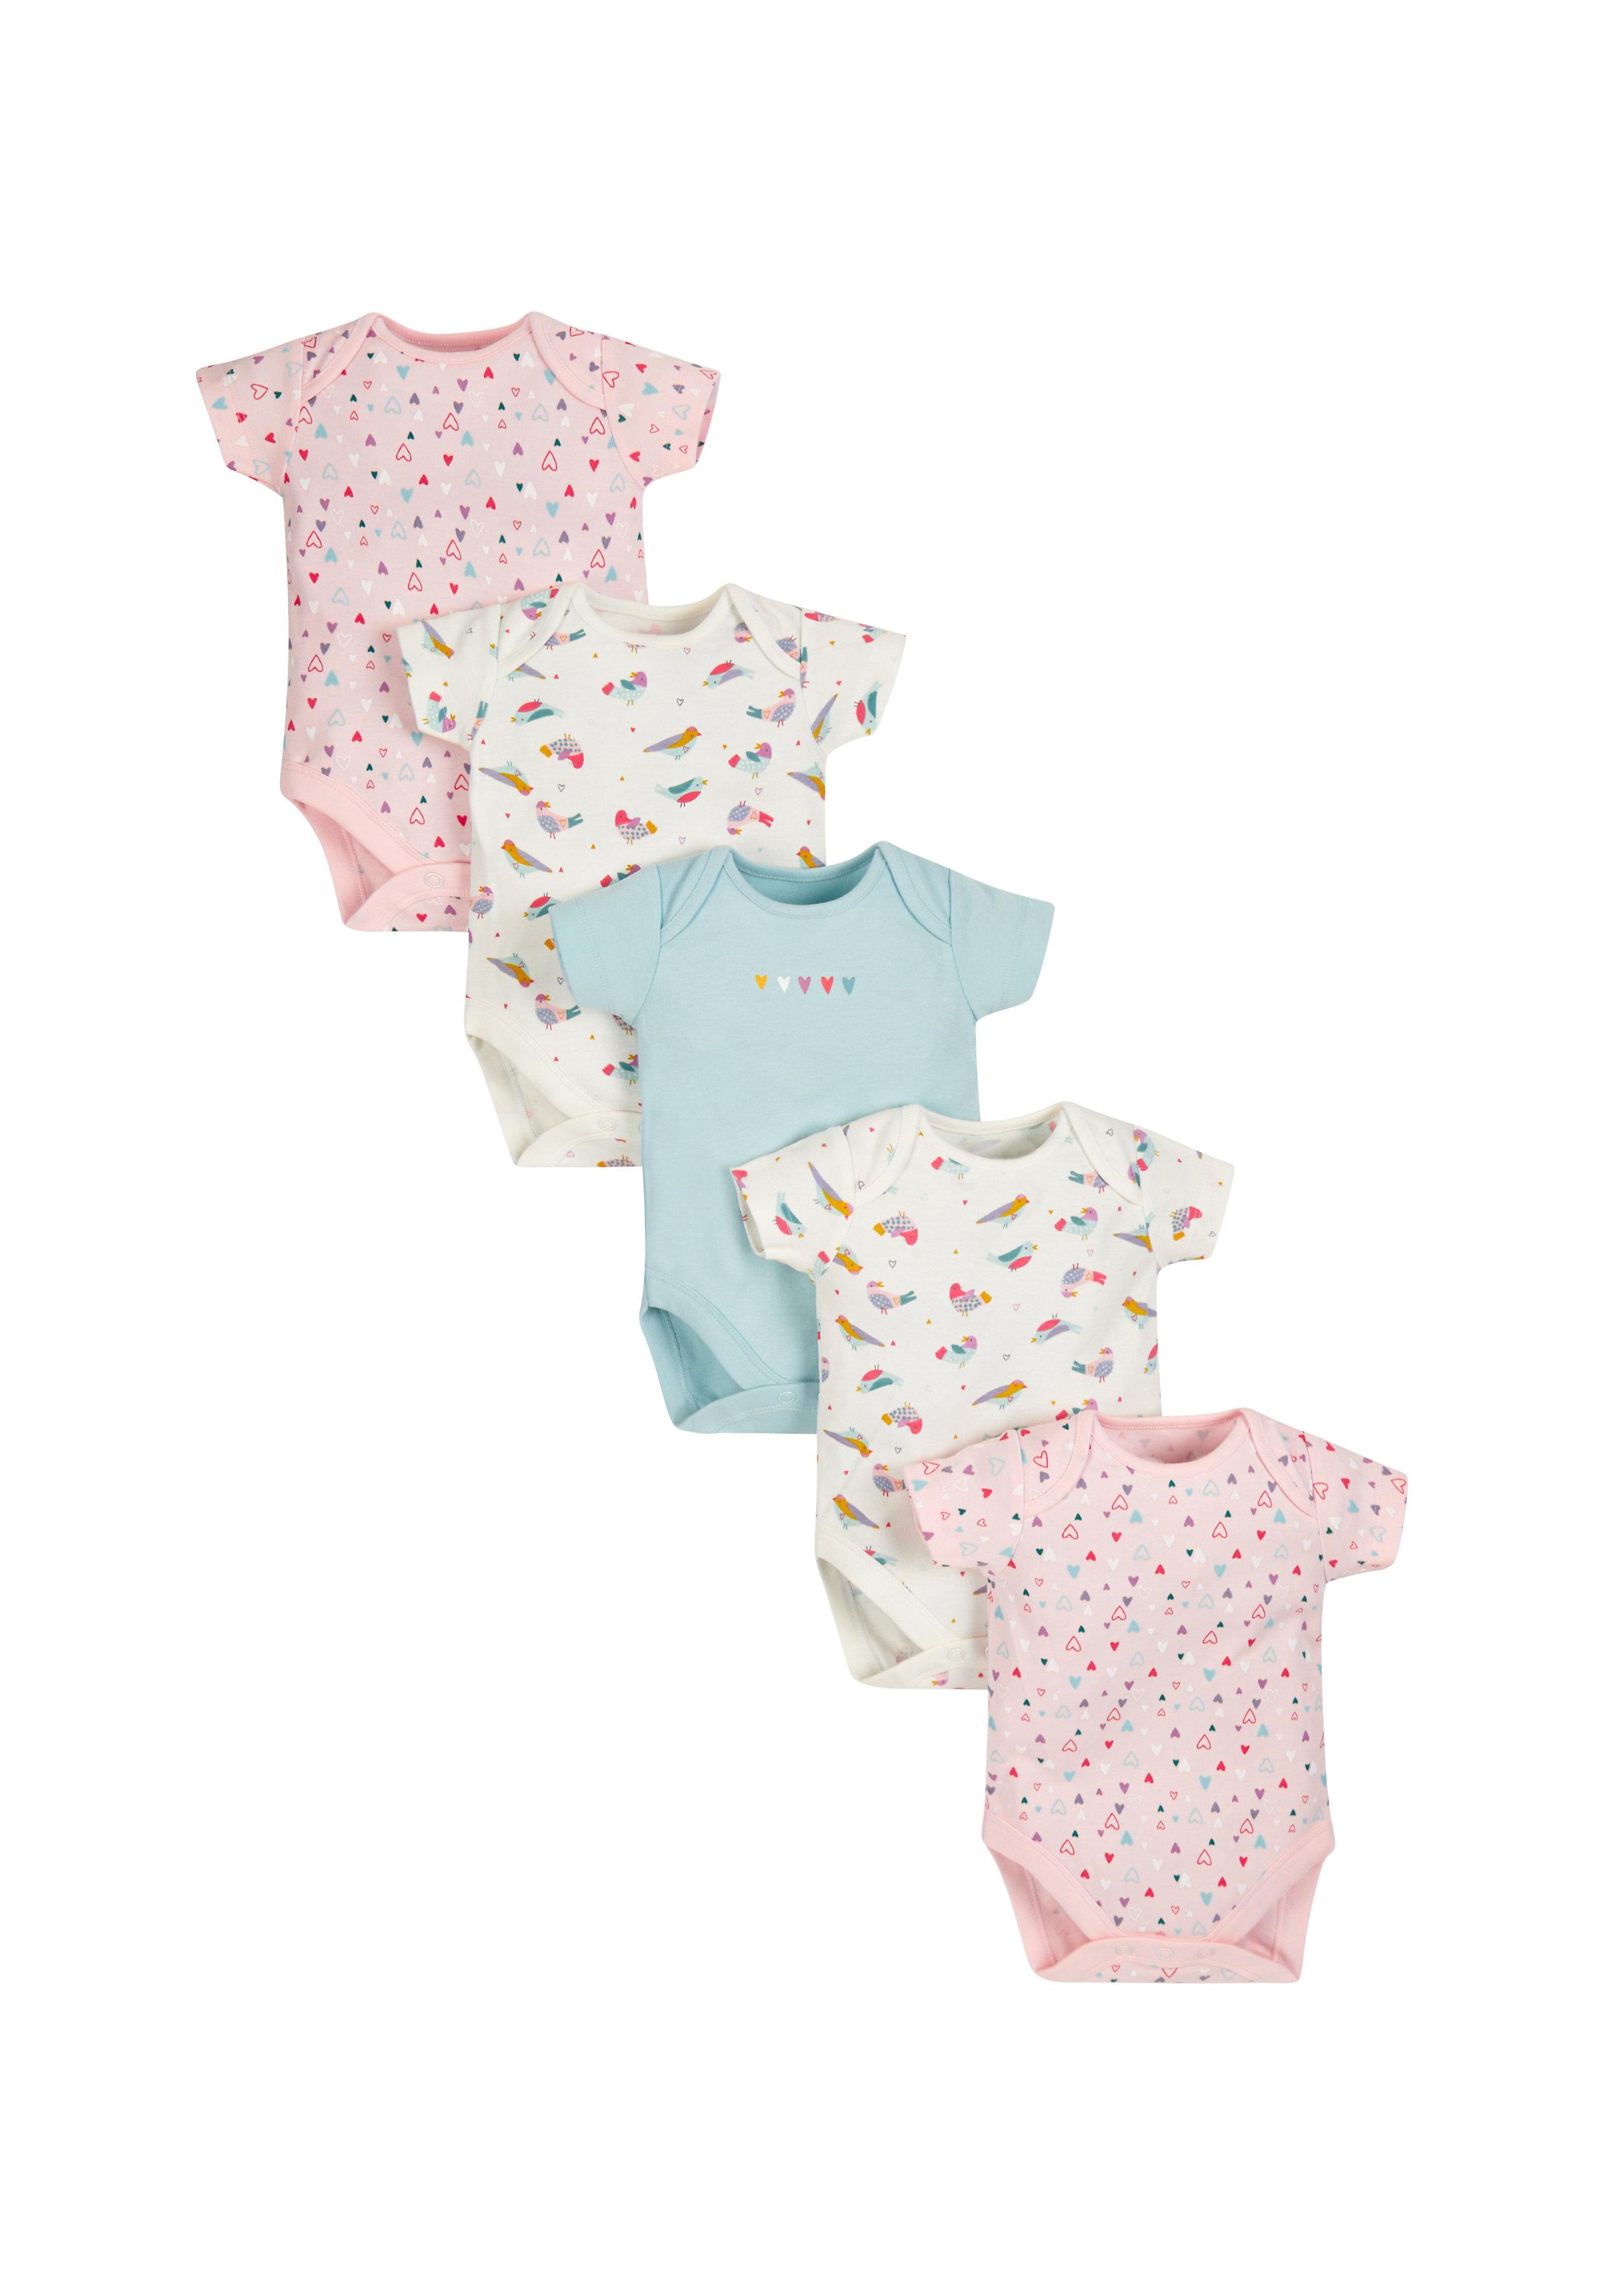 Mothercare | Girls Full Sleeves Onesies - Pack of 5 - Multicolor